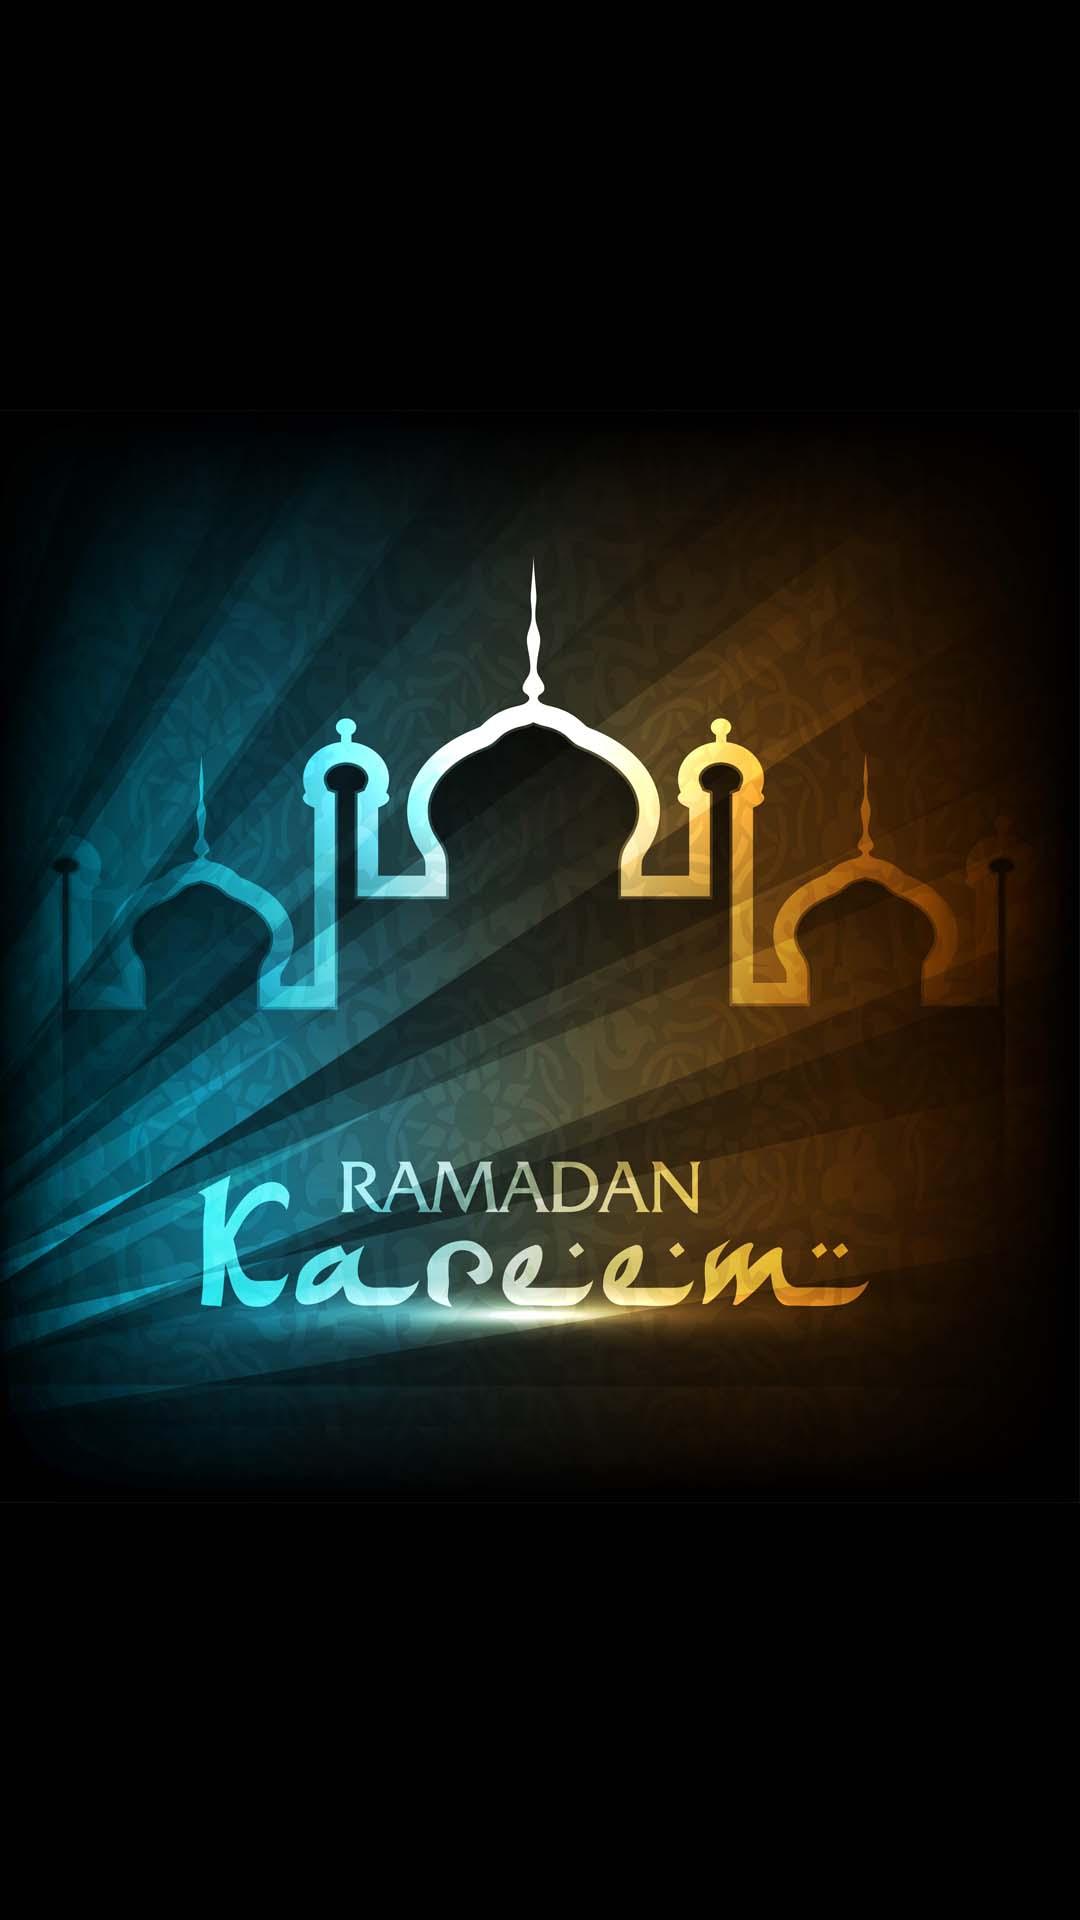 خلفيات موبايل رمضان كريم Mobile Wallpapers HD 10 خلفيات موبايل رمضان كريم Mobile Wallpapers HD